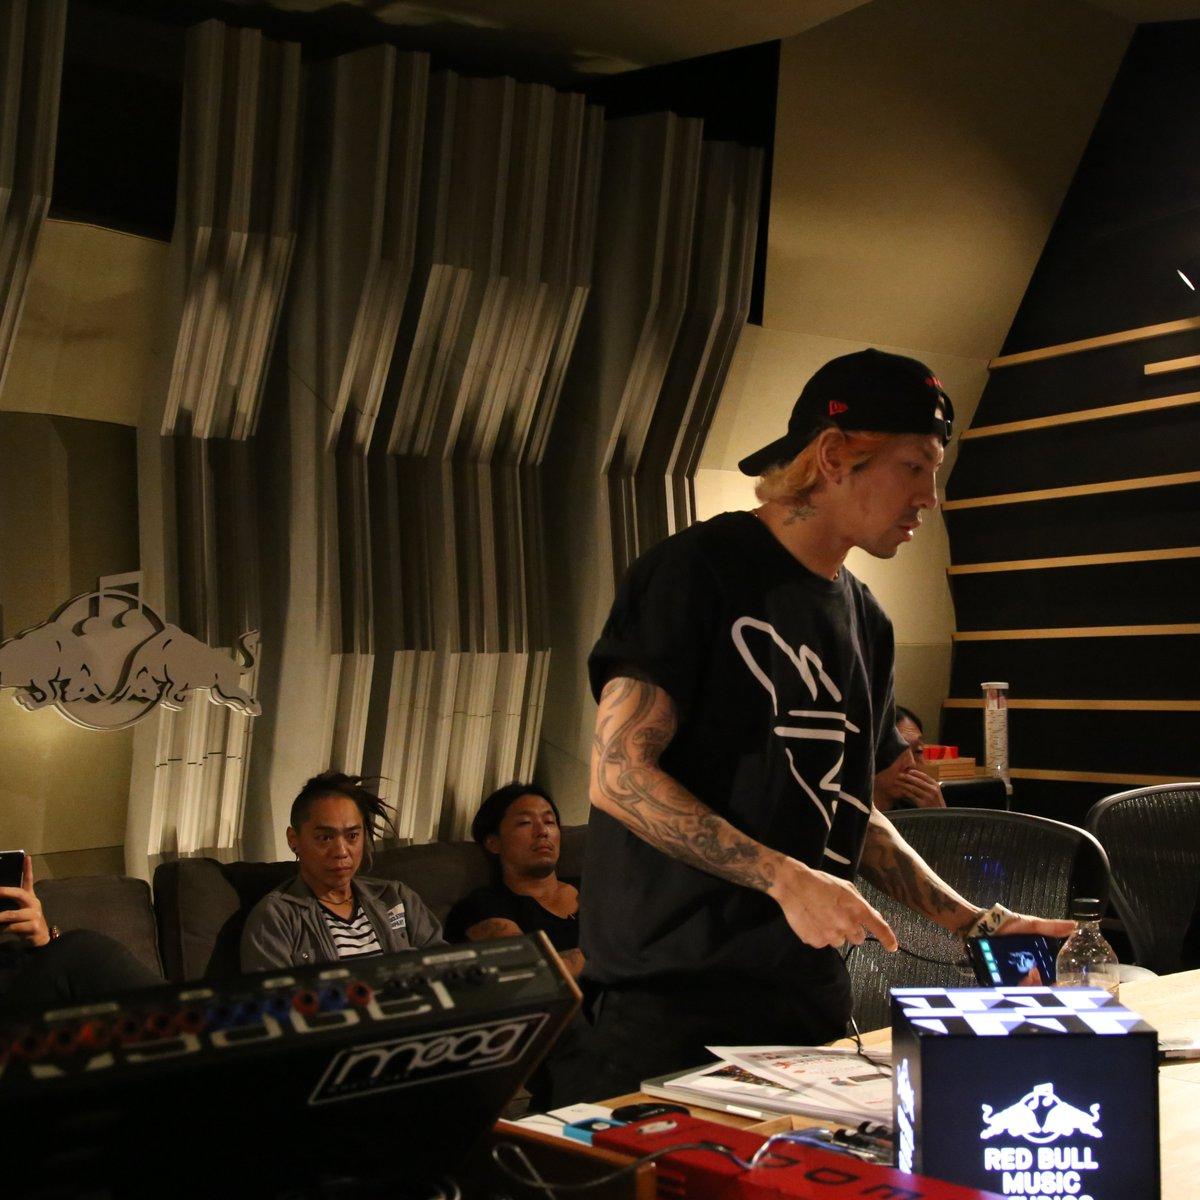 12/18 Release!トリビュートアルバム 「ROTTENGRAFFTY Tribute Album 〜MOUSE TRAP〜」 Dragon Ashは「マンダーラ」をカバー! Recored at RED BULL STUDIOS TOKYO